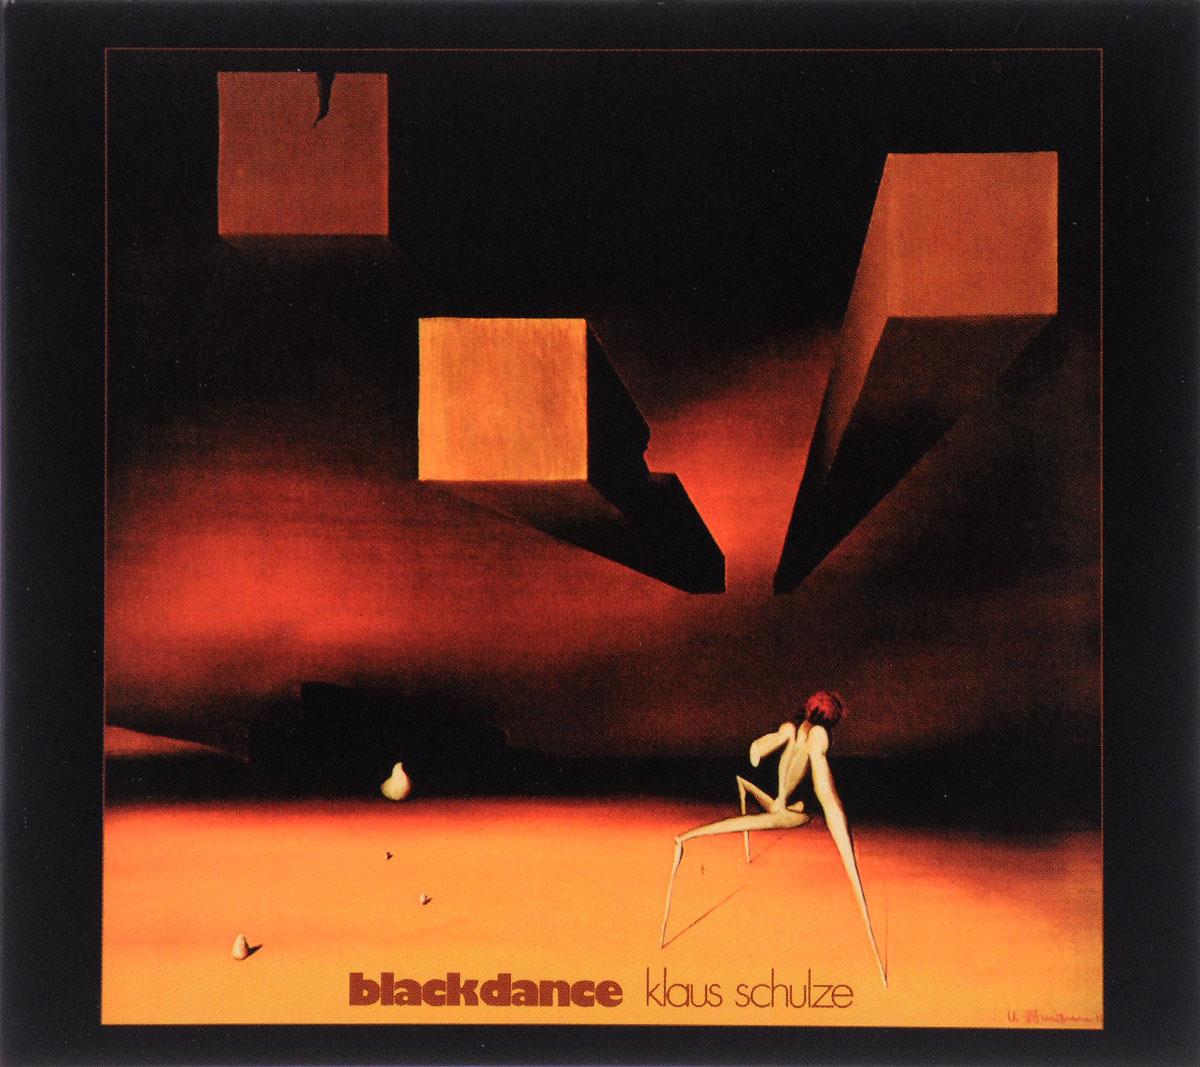 Klaus Schulze. Blackdance